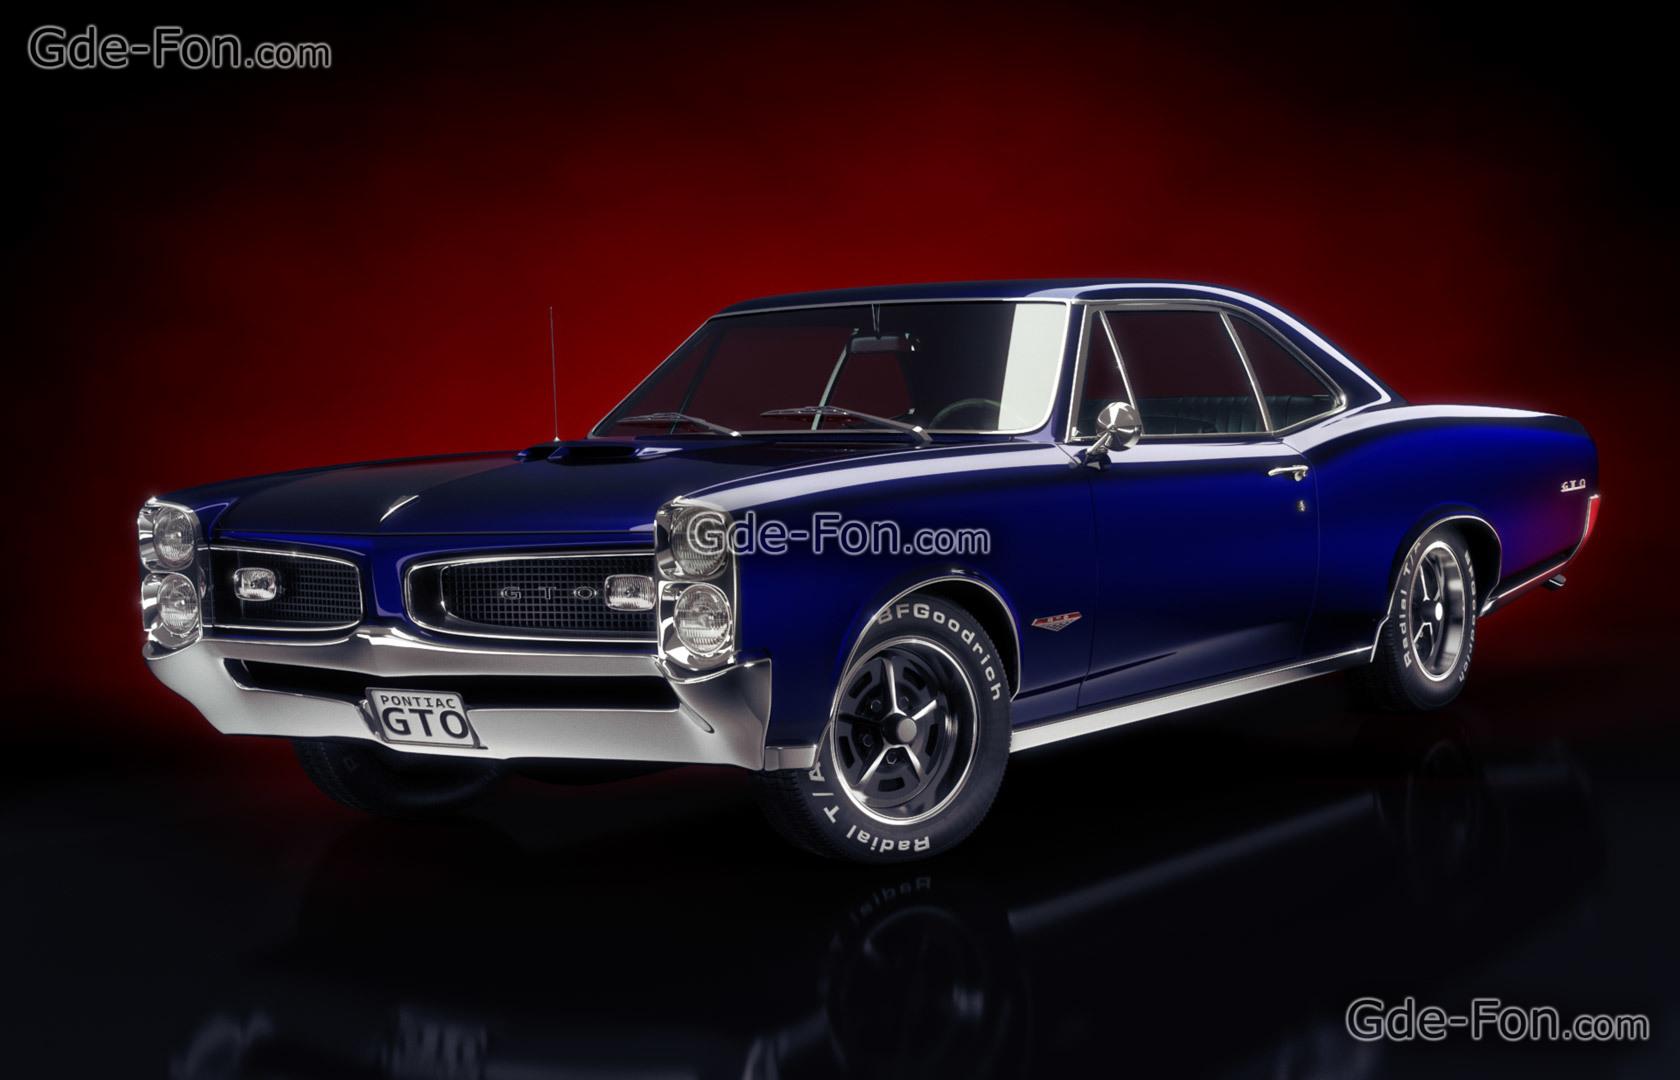 1969 Pontiac Gto Wallpaper   image 102 1680x1080